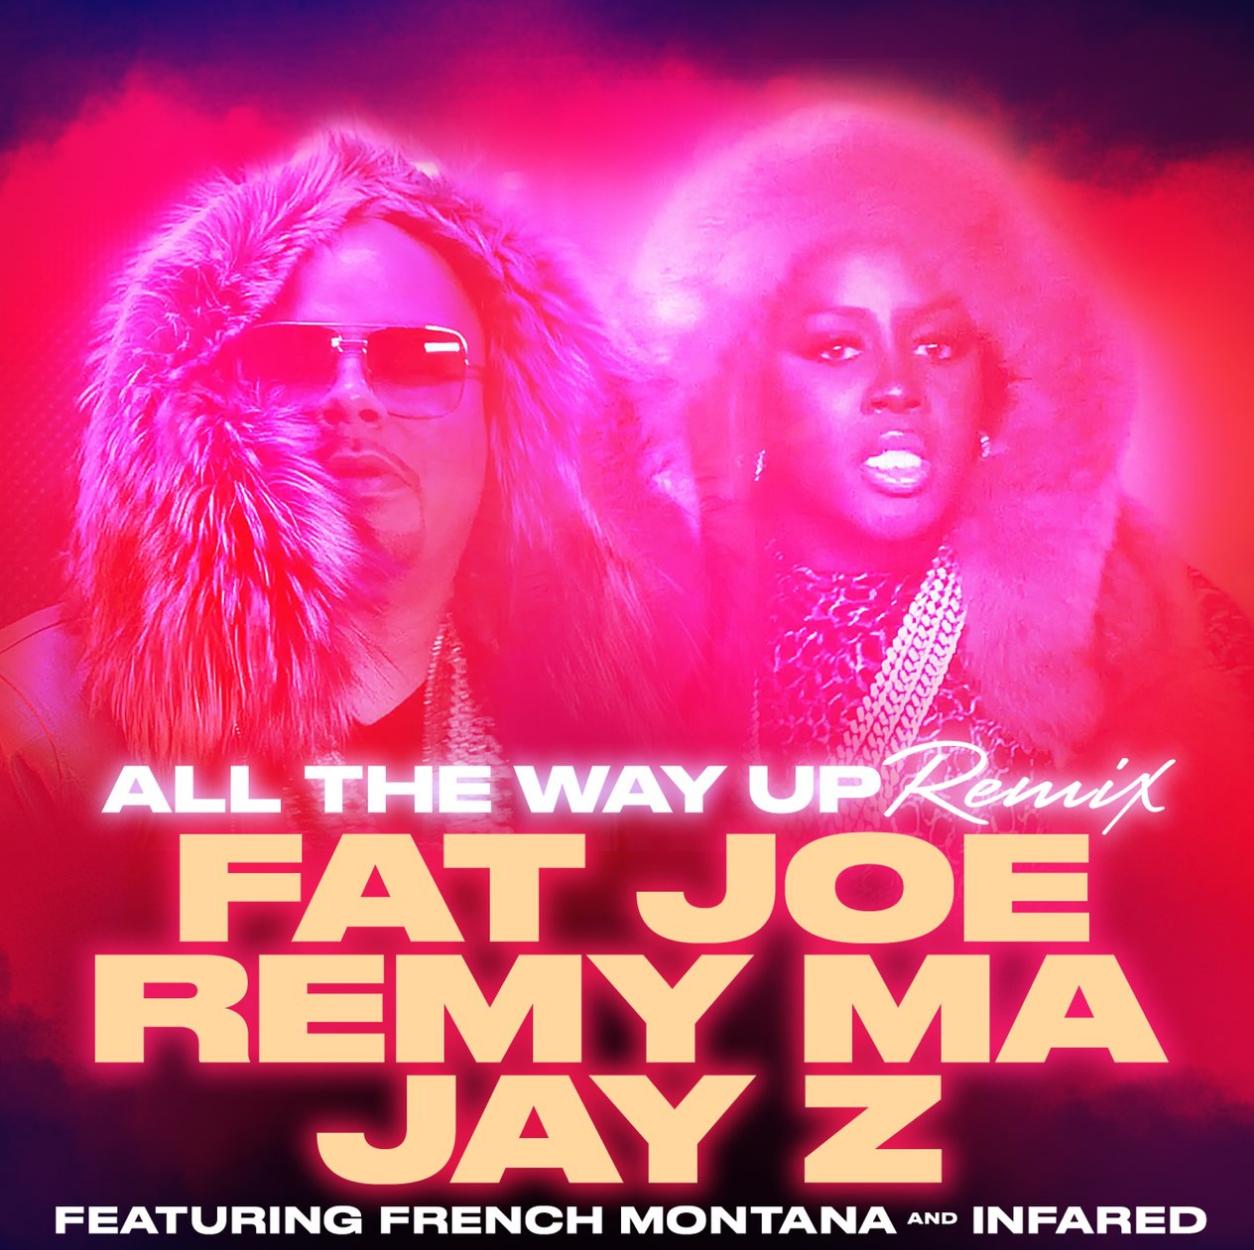 fat-joe-remy-ma-jay-z-all-the-way-up-remix-stream